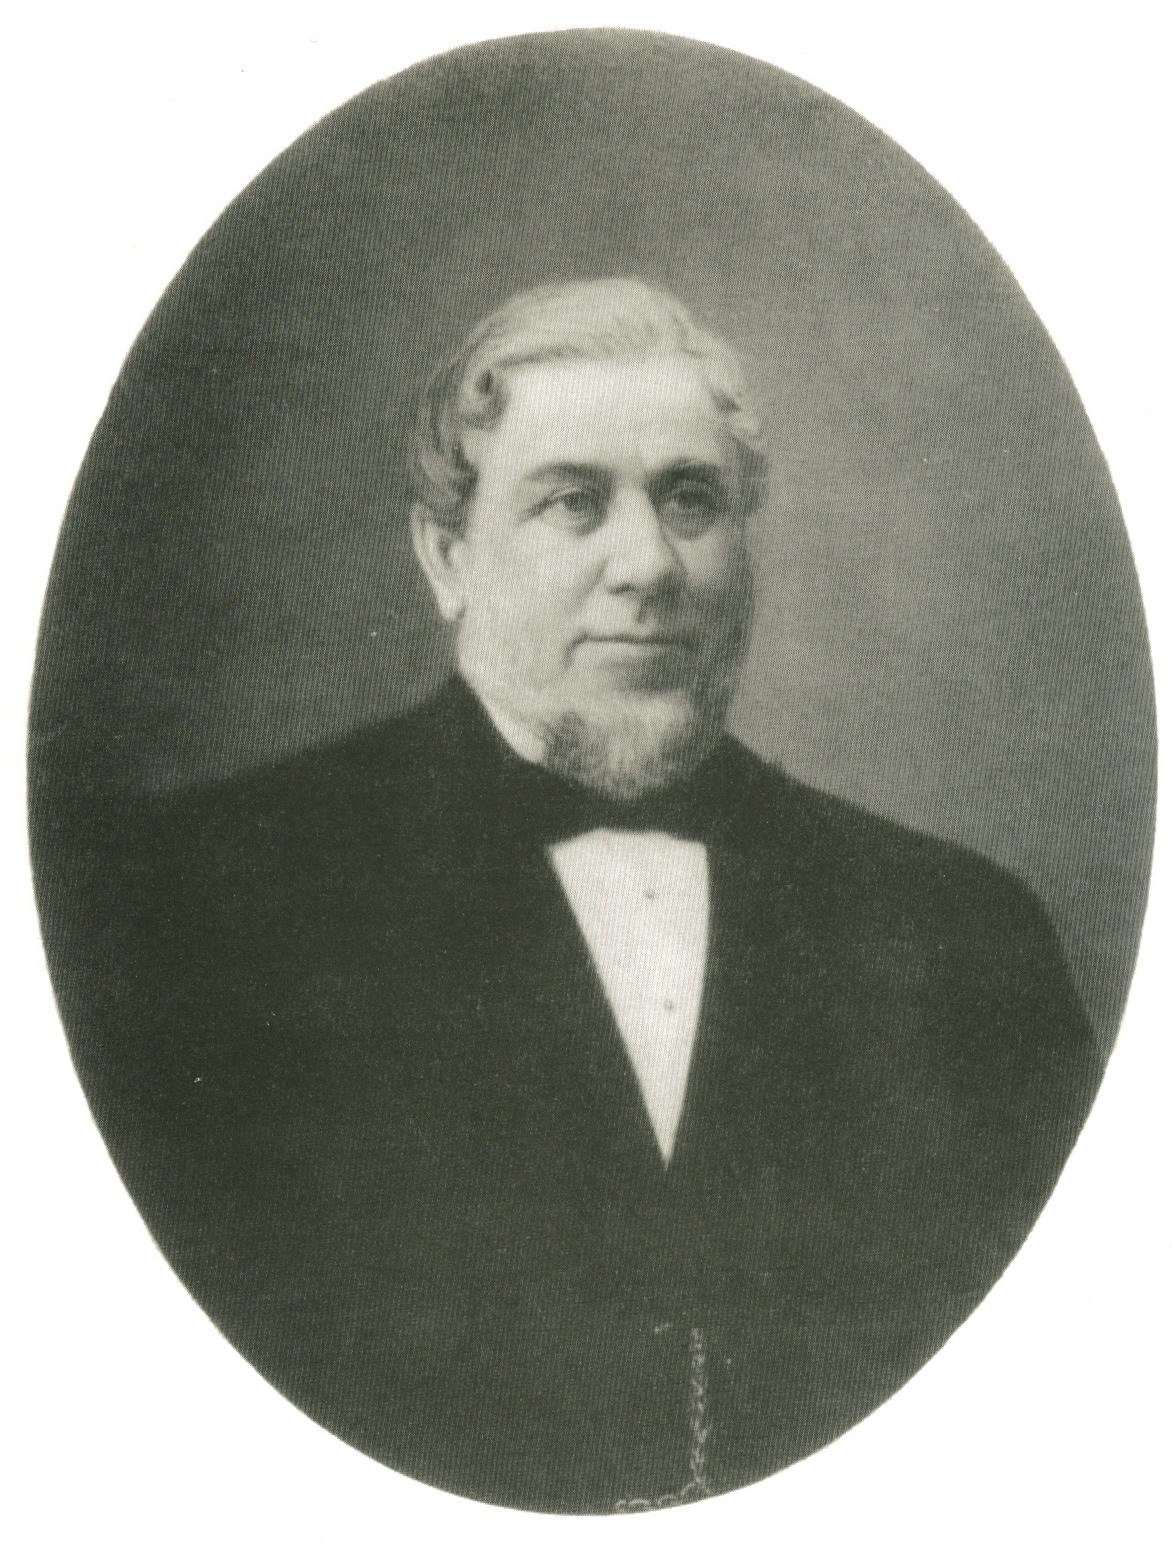 https://upload.wikimedia.org/wikipedia/commons/f/f2/John_James_Hughes.jpg